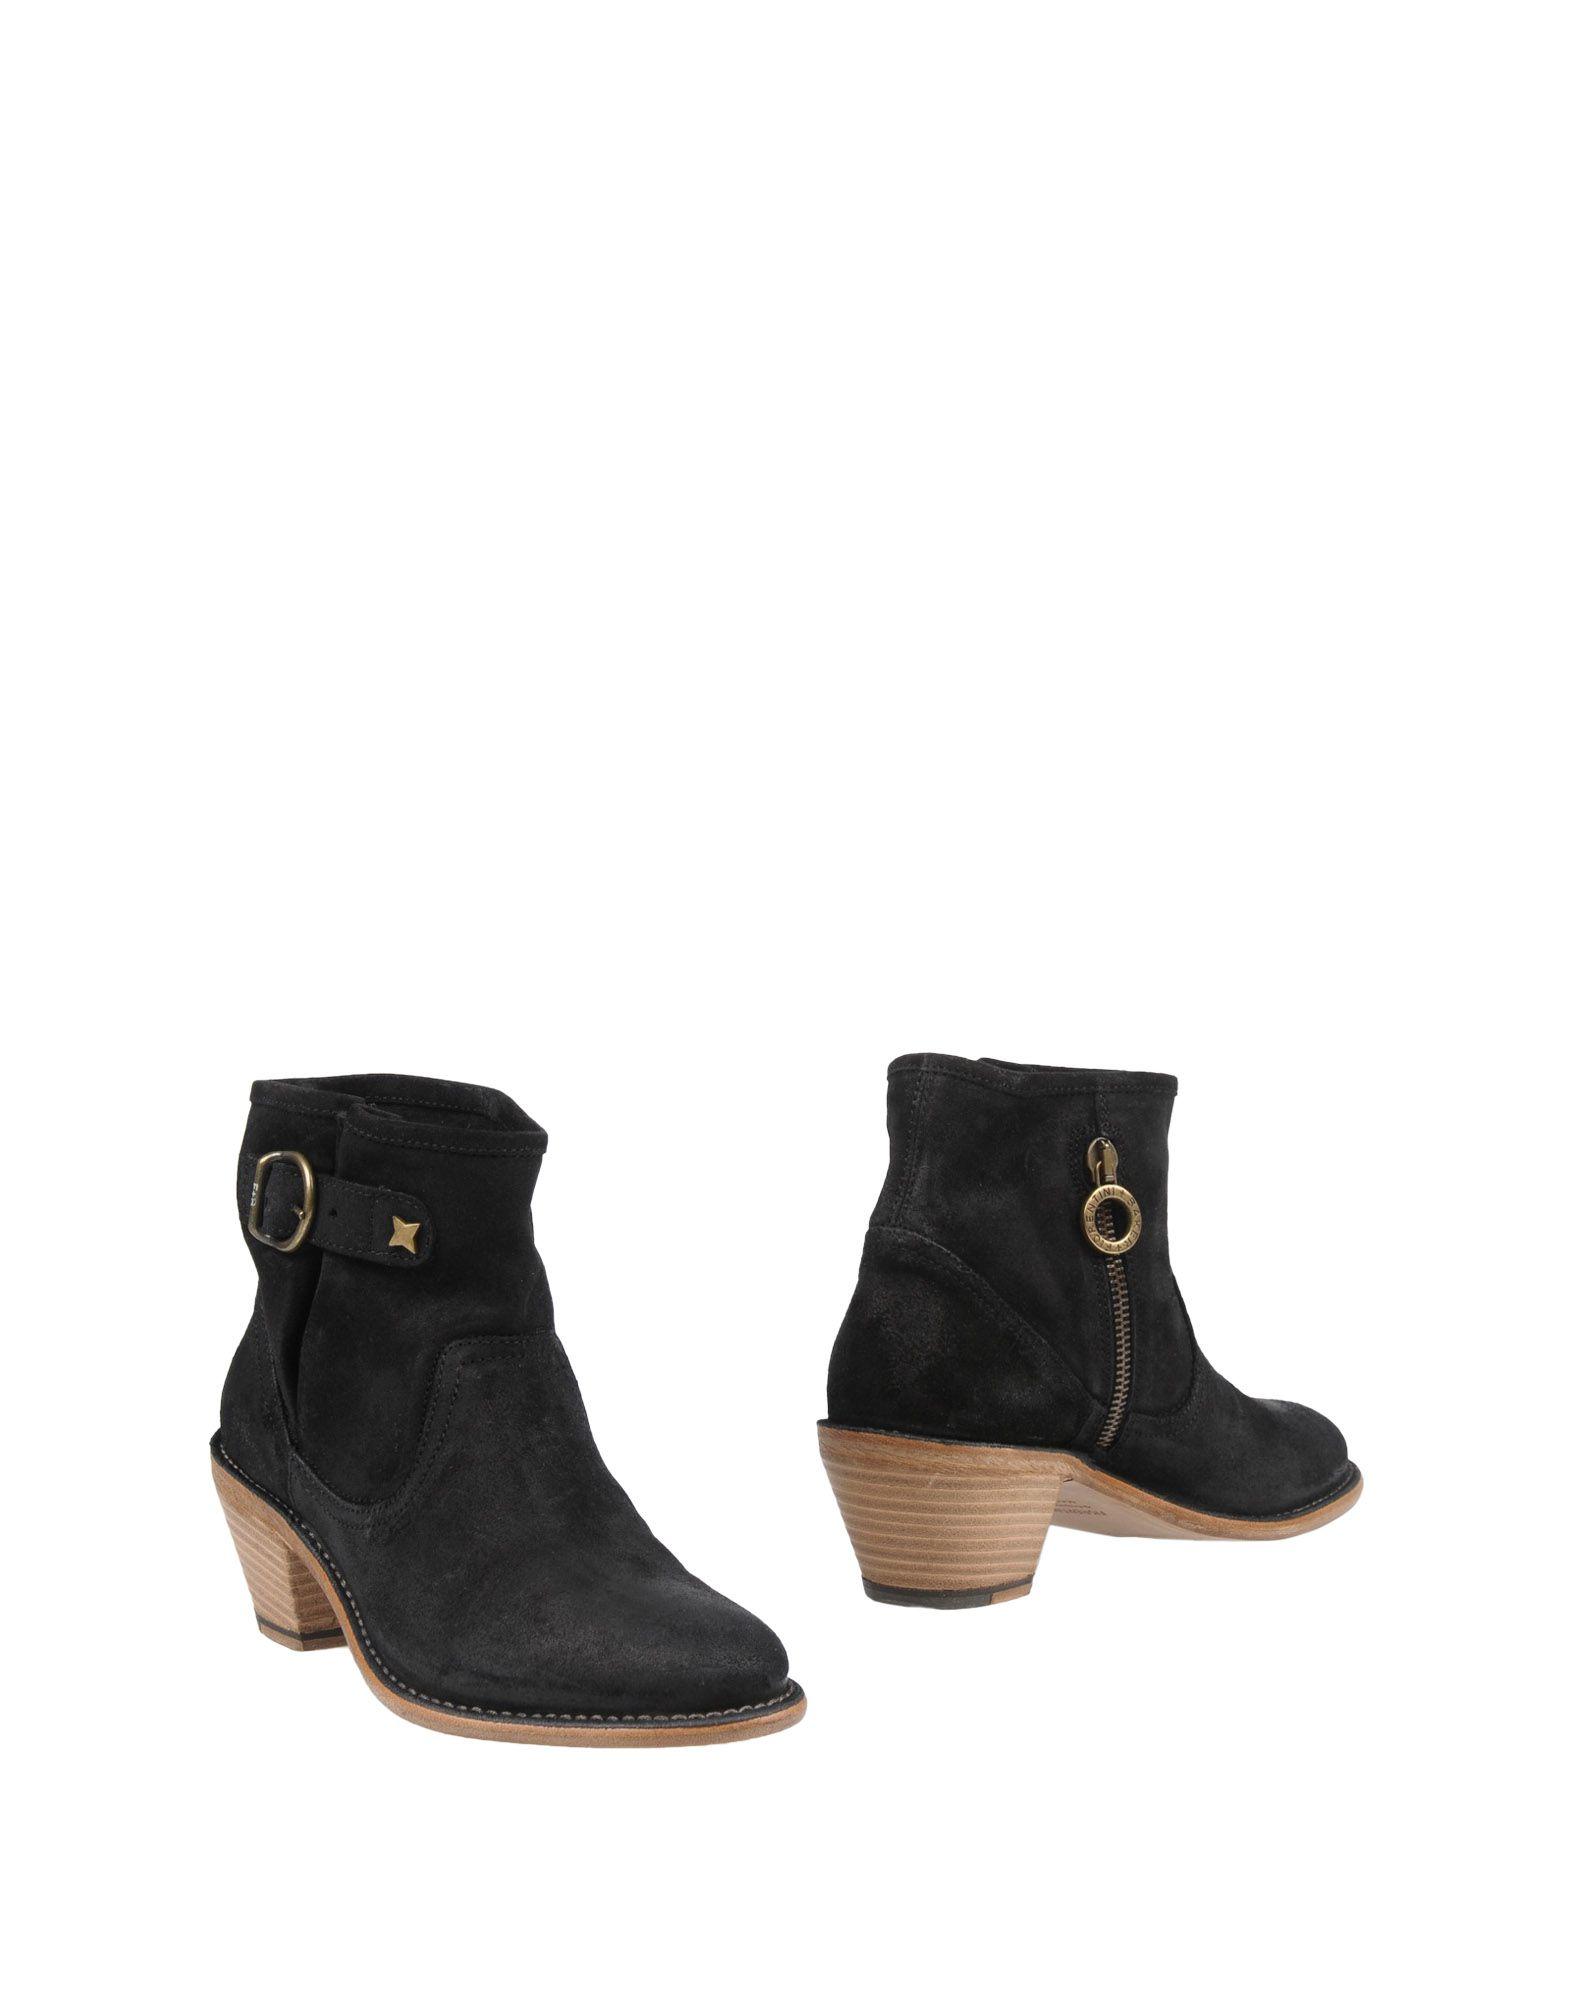 Fiorentini+Baker Gute Stiefelette Damen  11419367CH Gute Fiorentini+Baker Qualität beliebte Schuhe 29e5d9